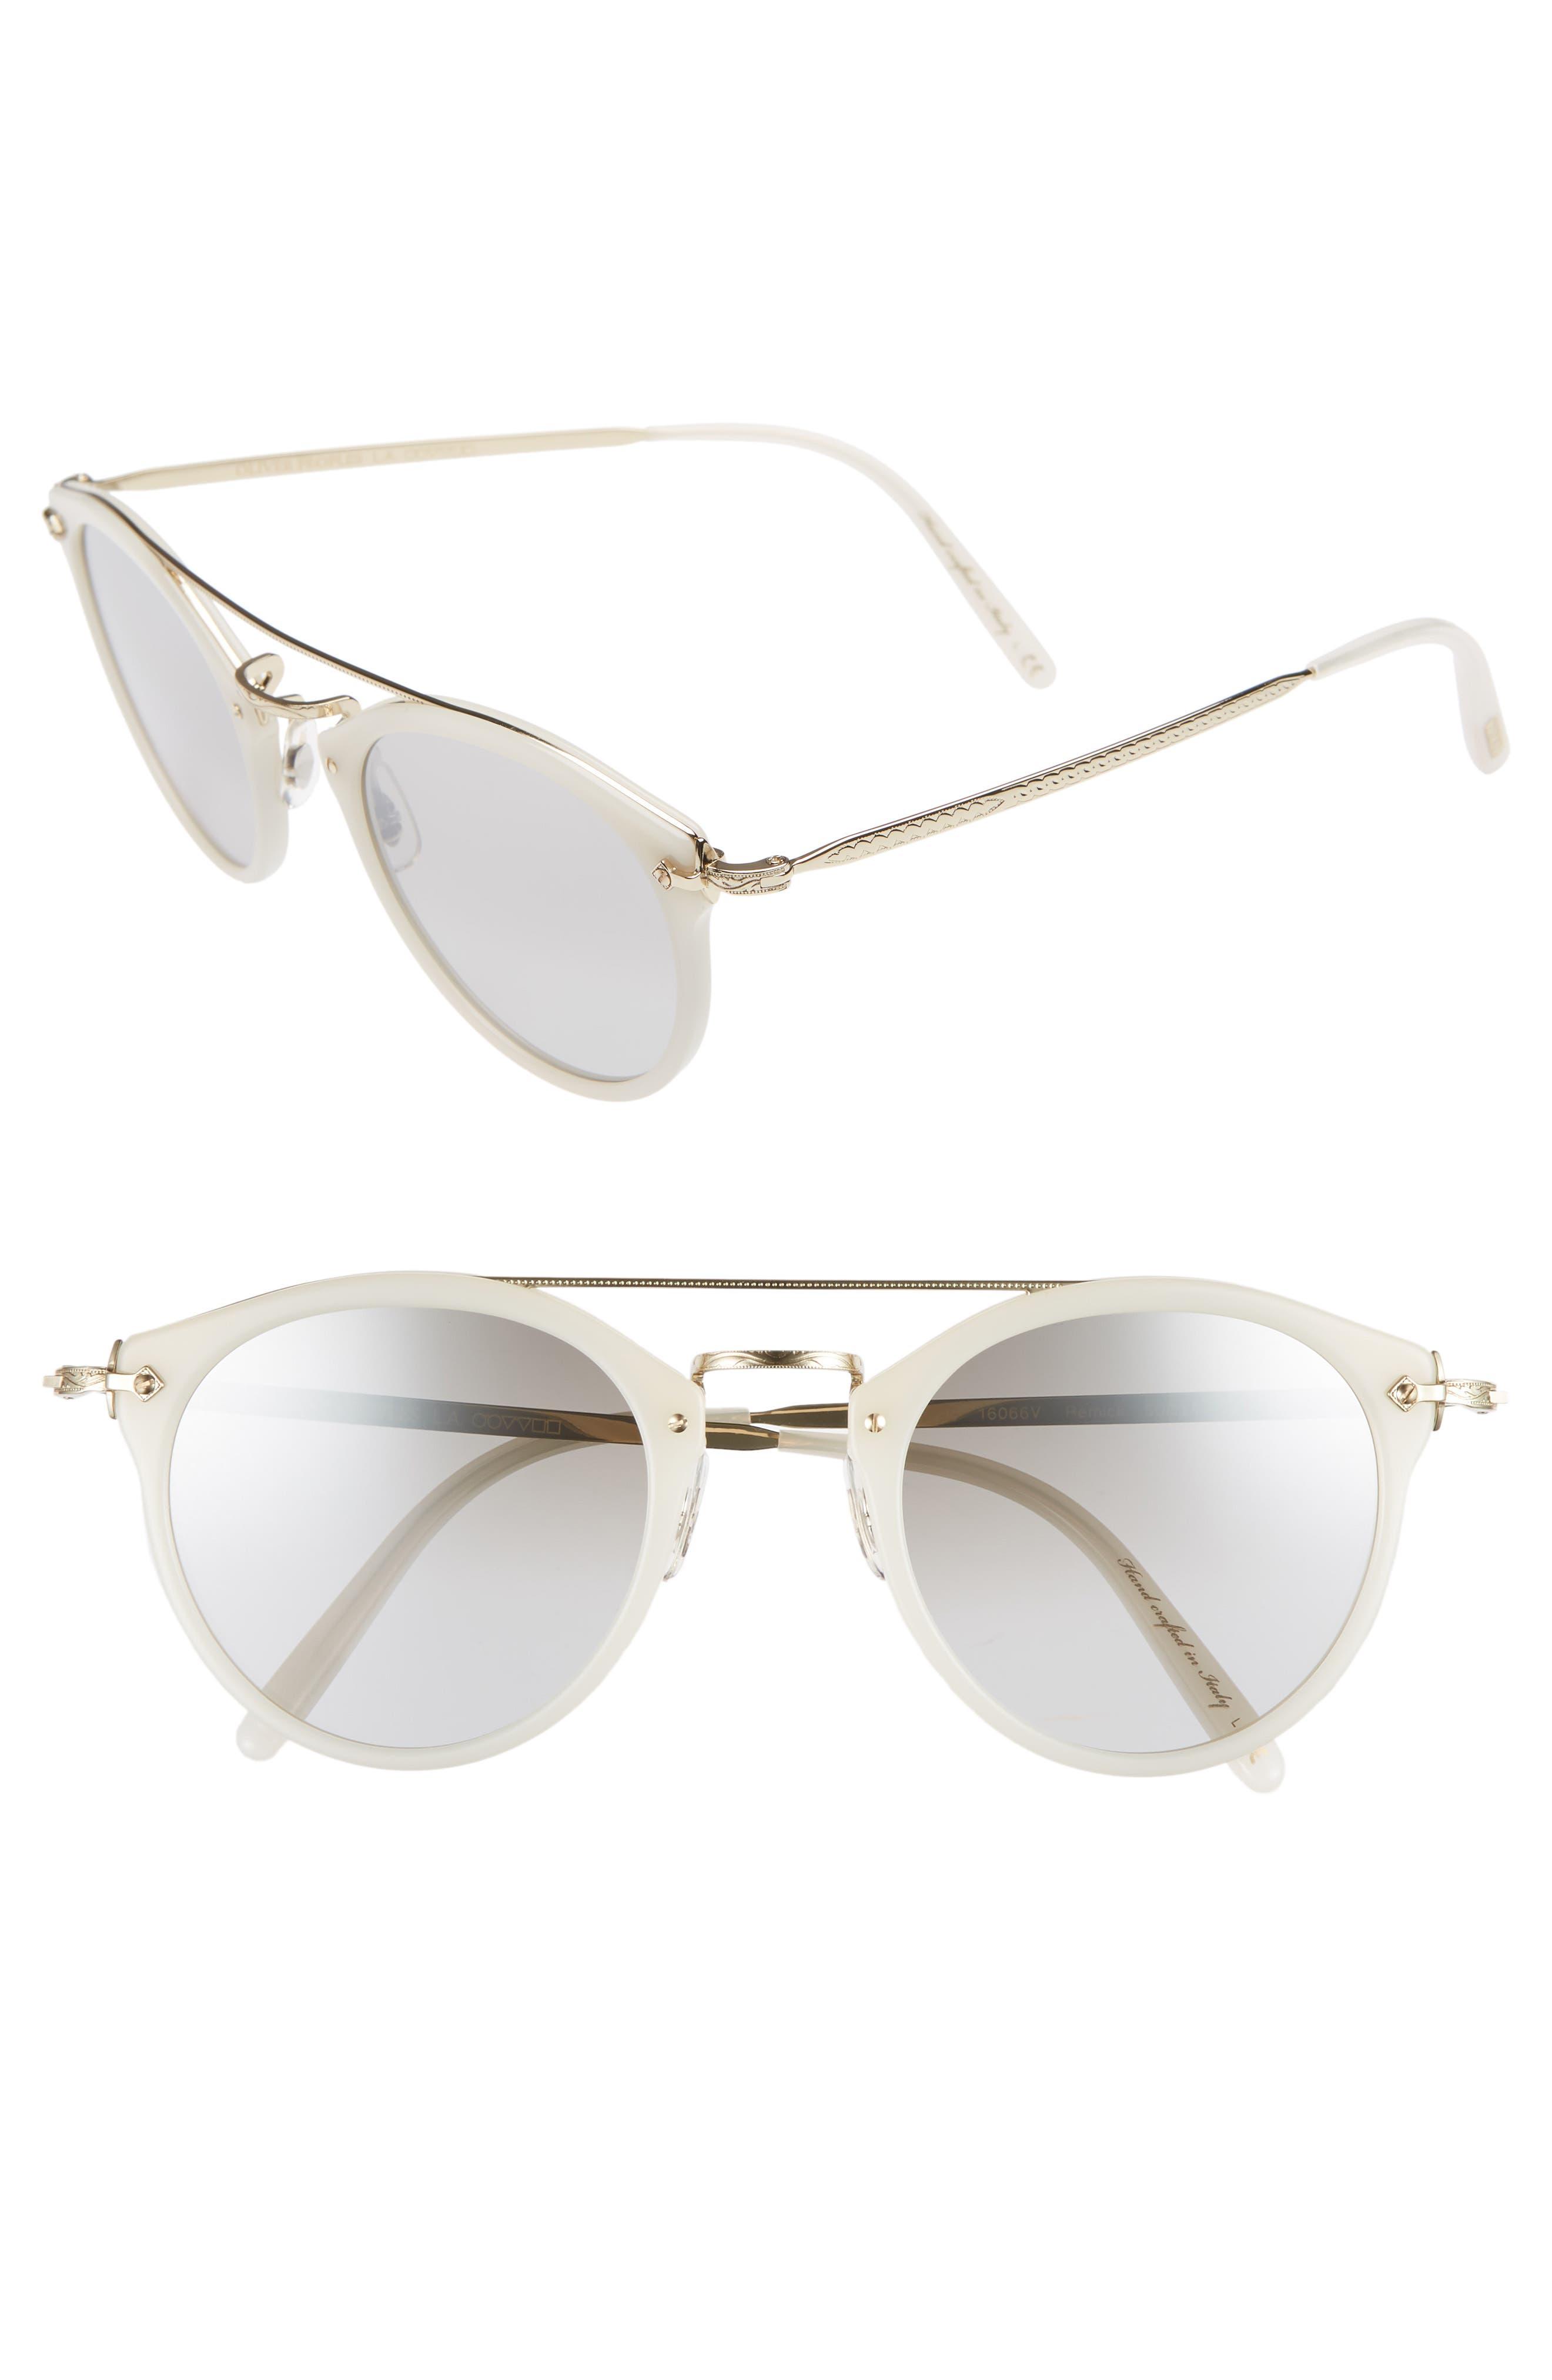 Remick 50mm Brow Bar Sunglasses,                             Main thumbnail 1, color,                             100